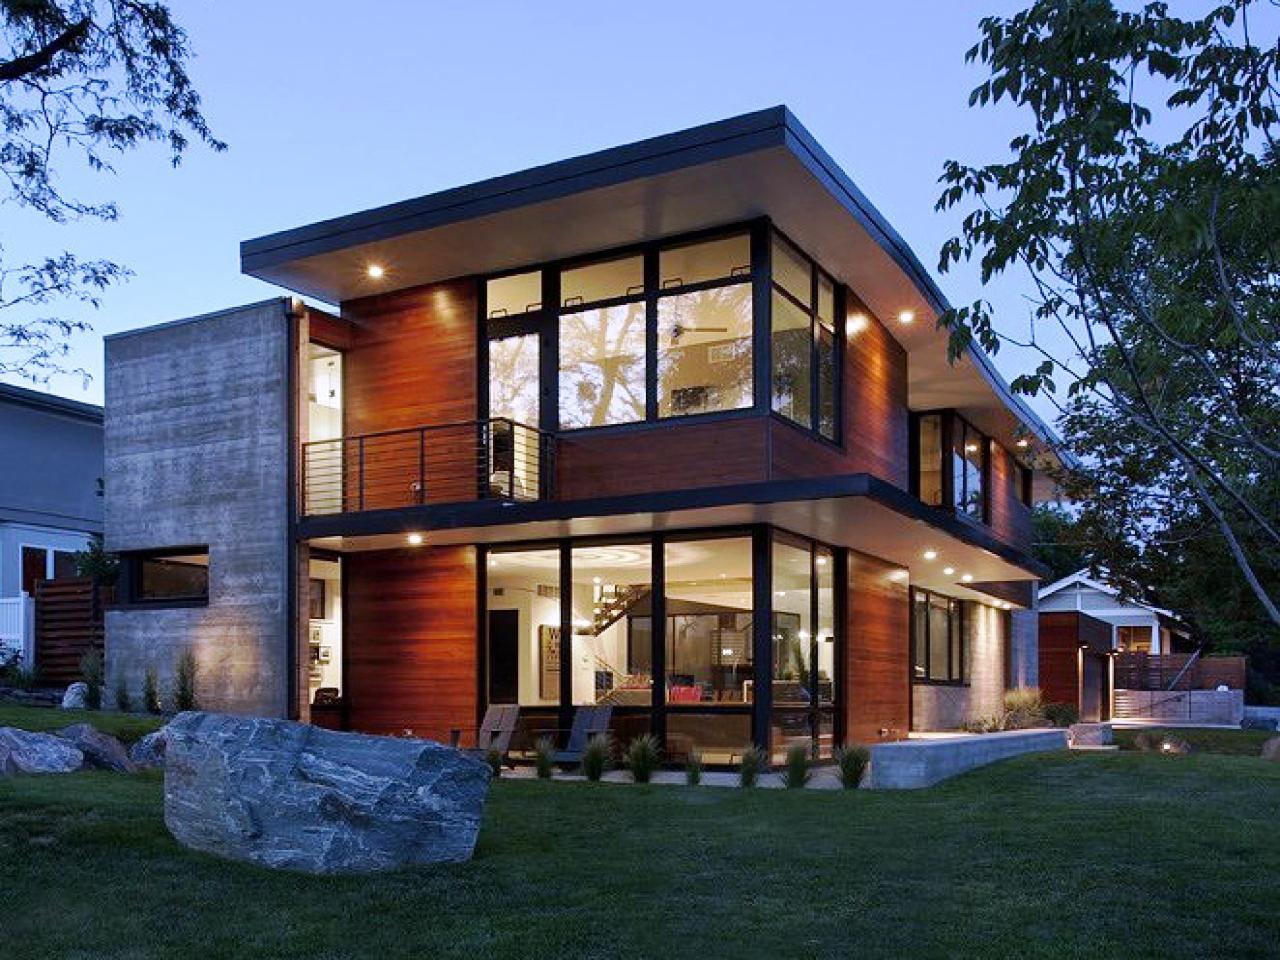 New Modern House Styles Schmidt Gallery Design The